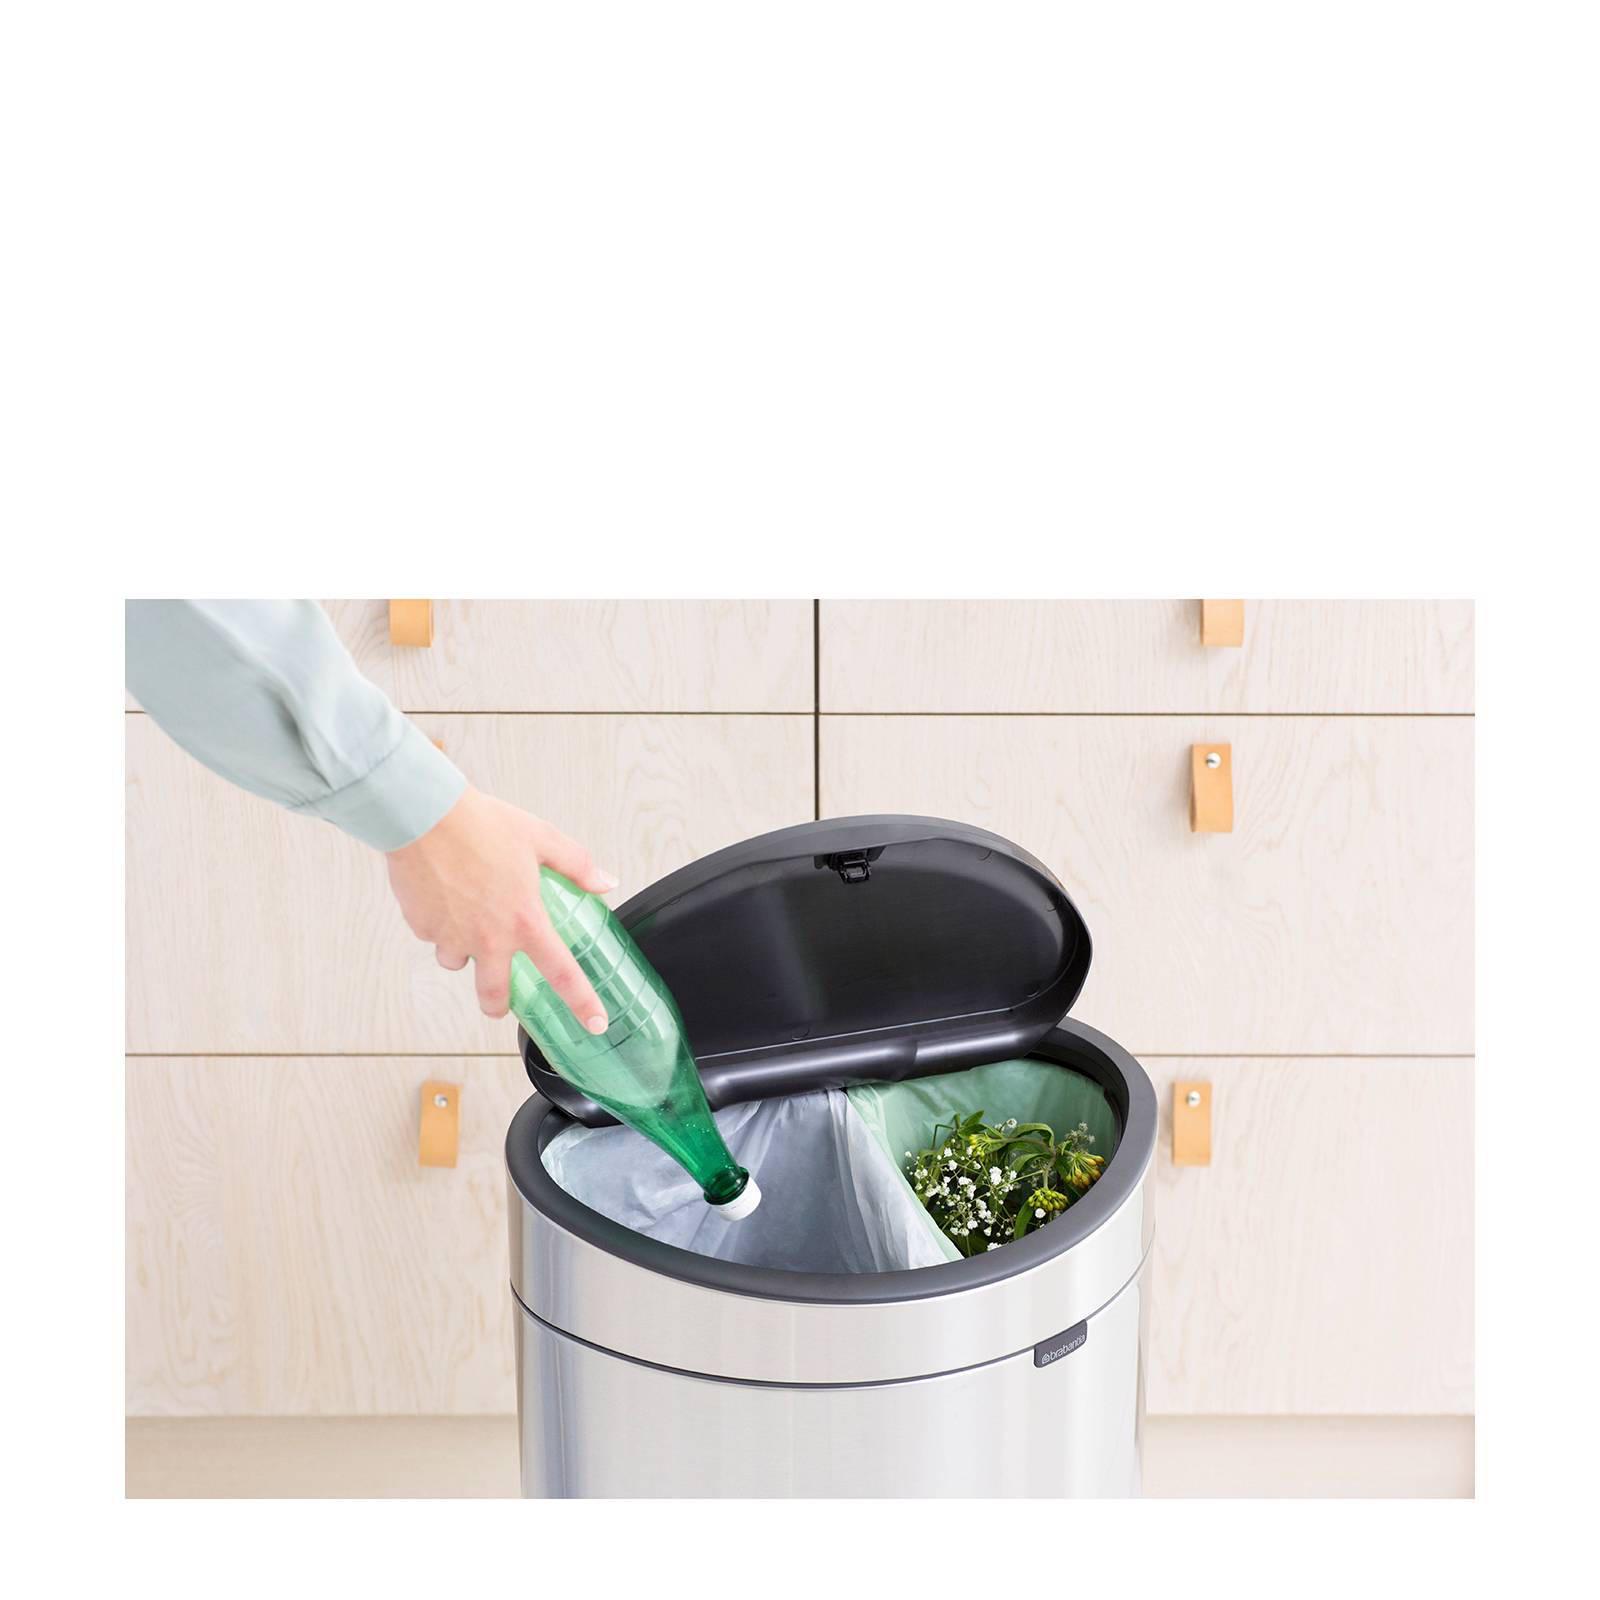 Prullenbak Brabantia Touch Bin 10 Liter.Touch Bin Recycle Prullenbak 23 10 Liter